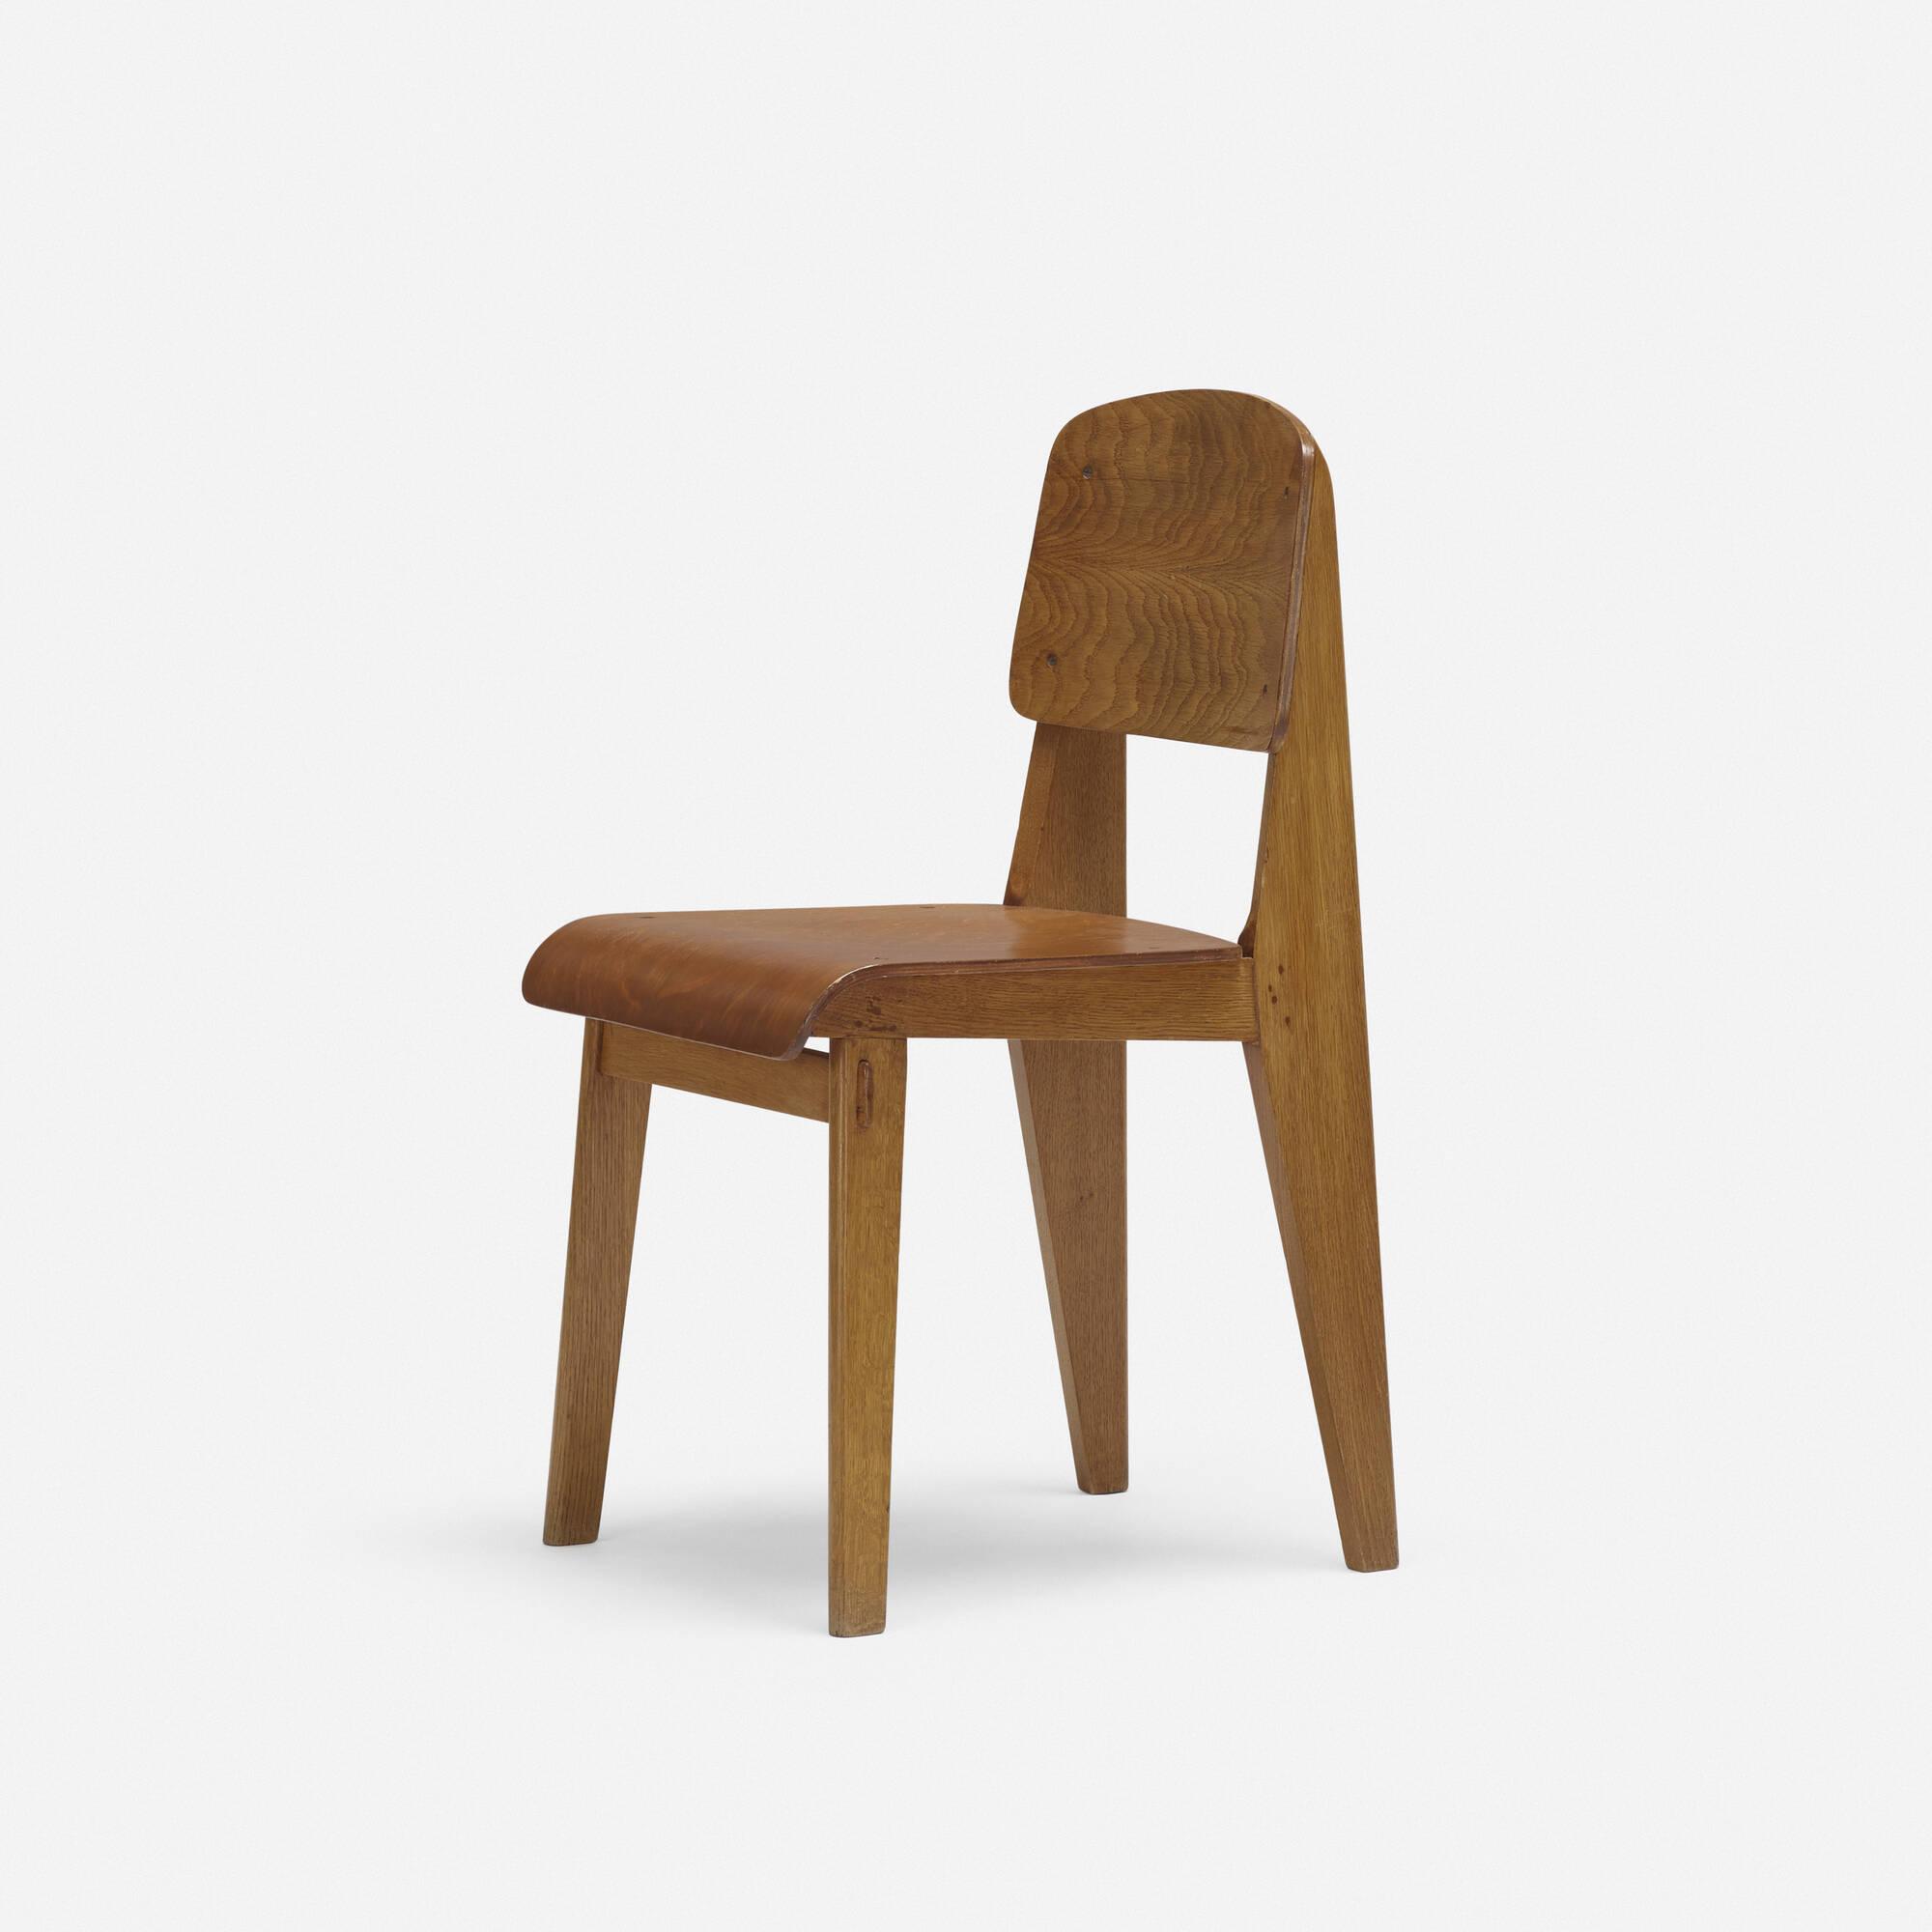 133 jean prouv standard chair no 305 - Jean prouve chaise standard ...